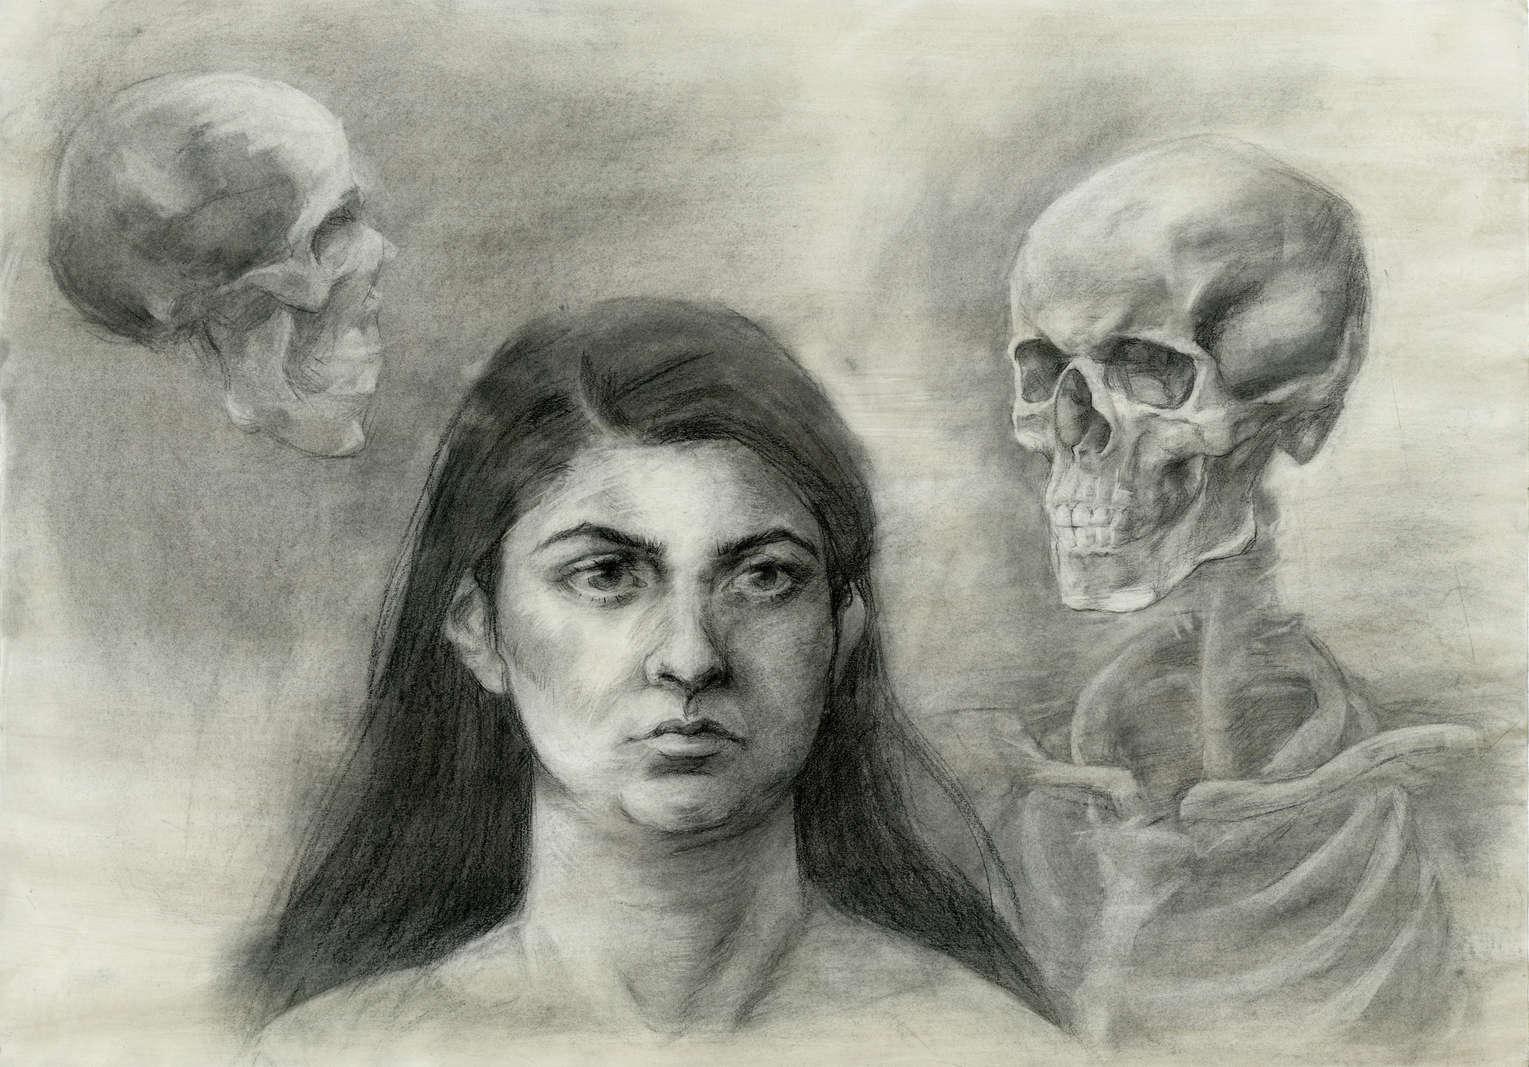 Anatomy Study - Head and Neck